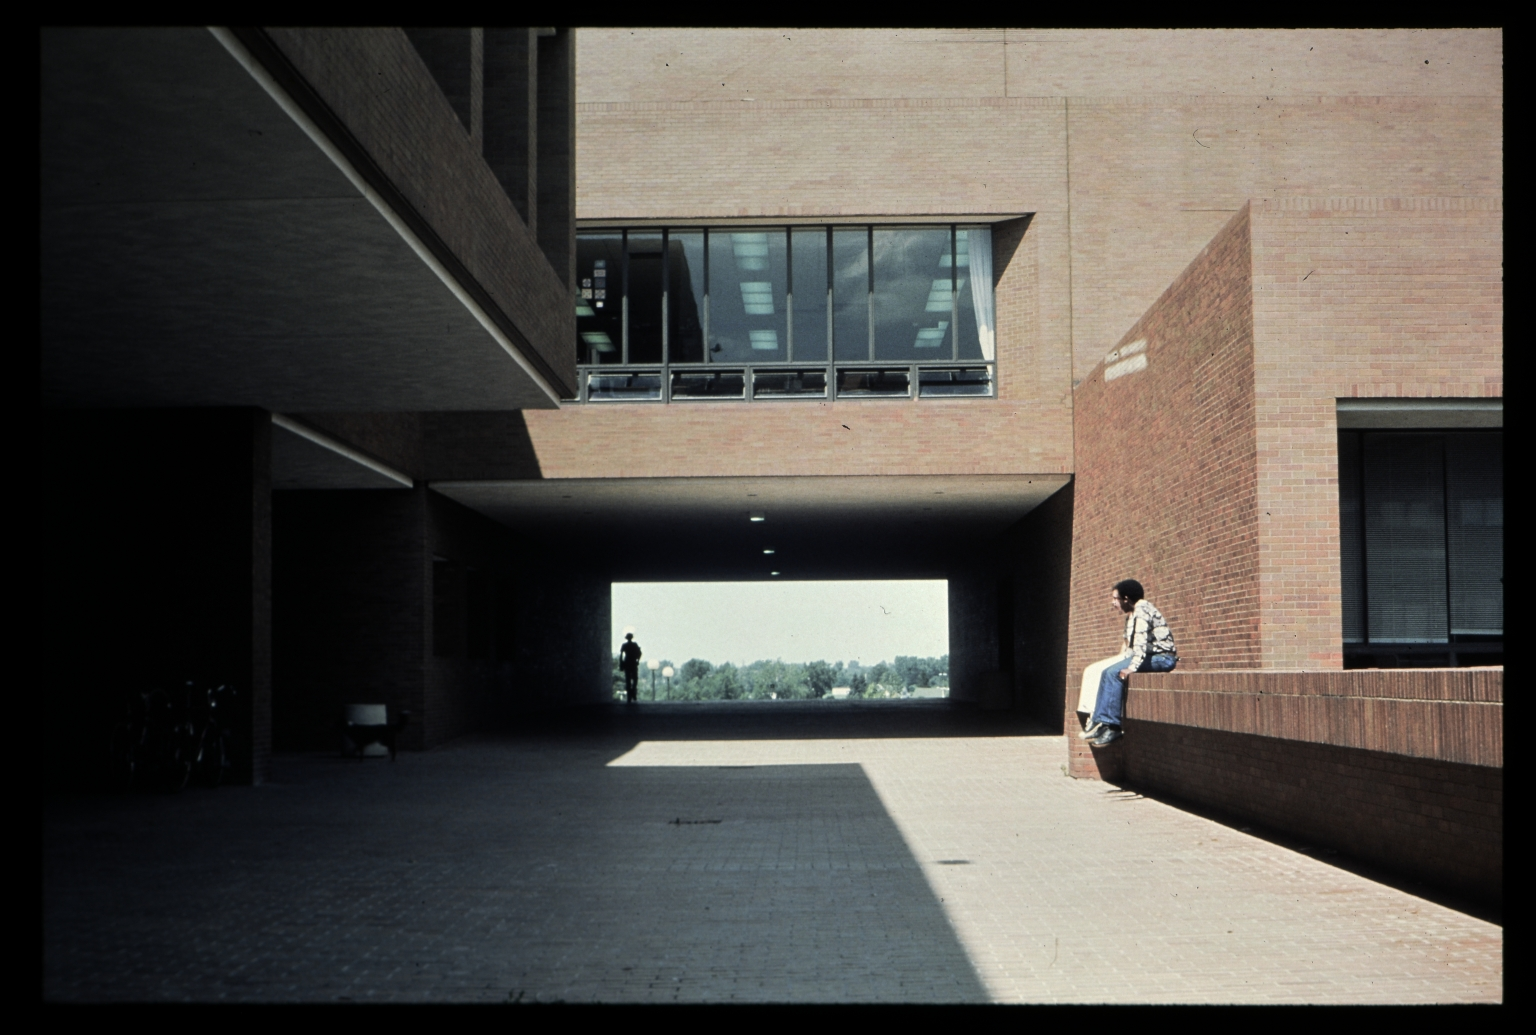 Walkway to James E. Booth Hall and Frank E. Gannett Hall